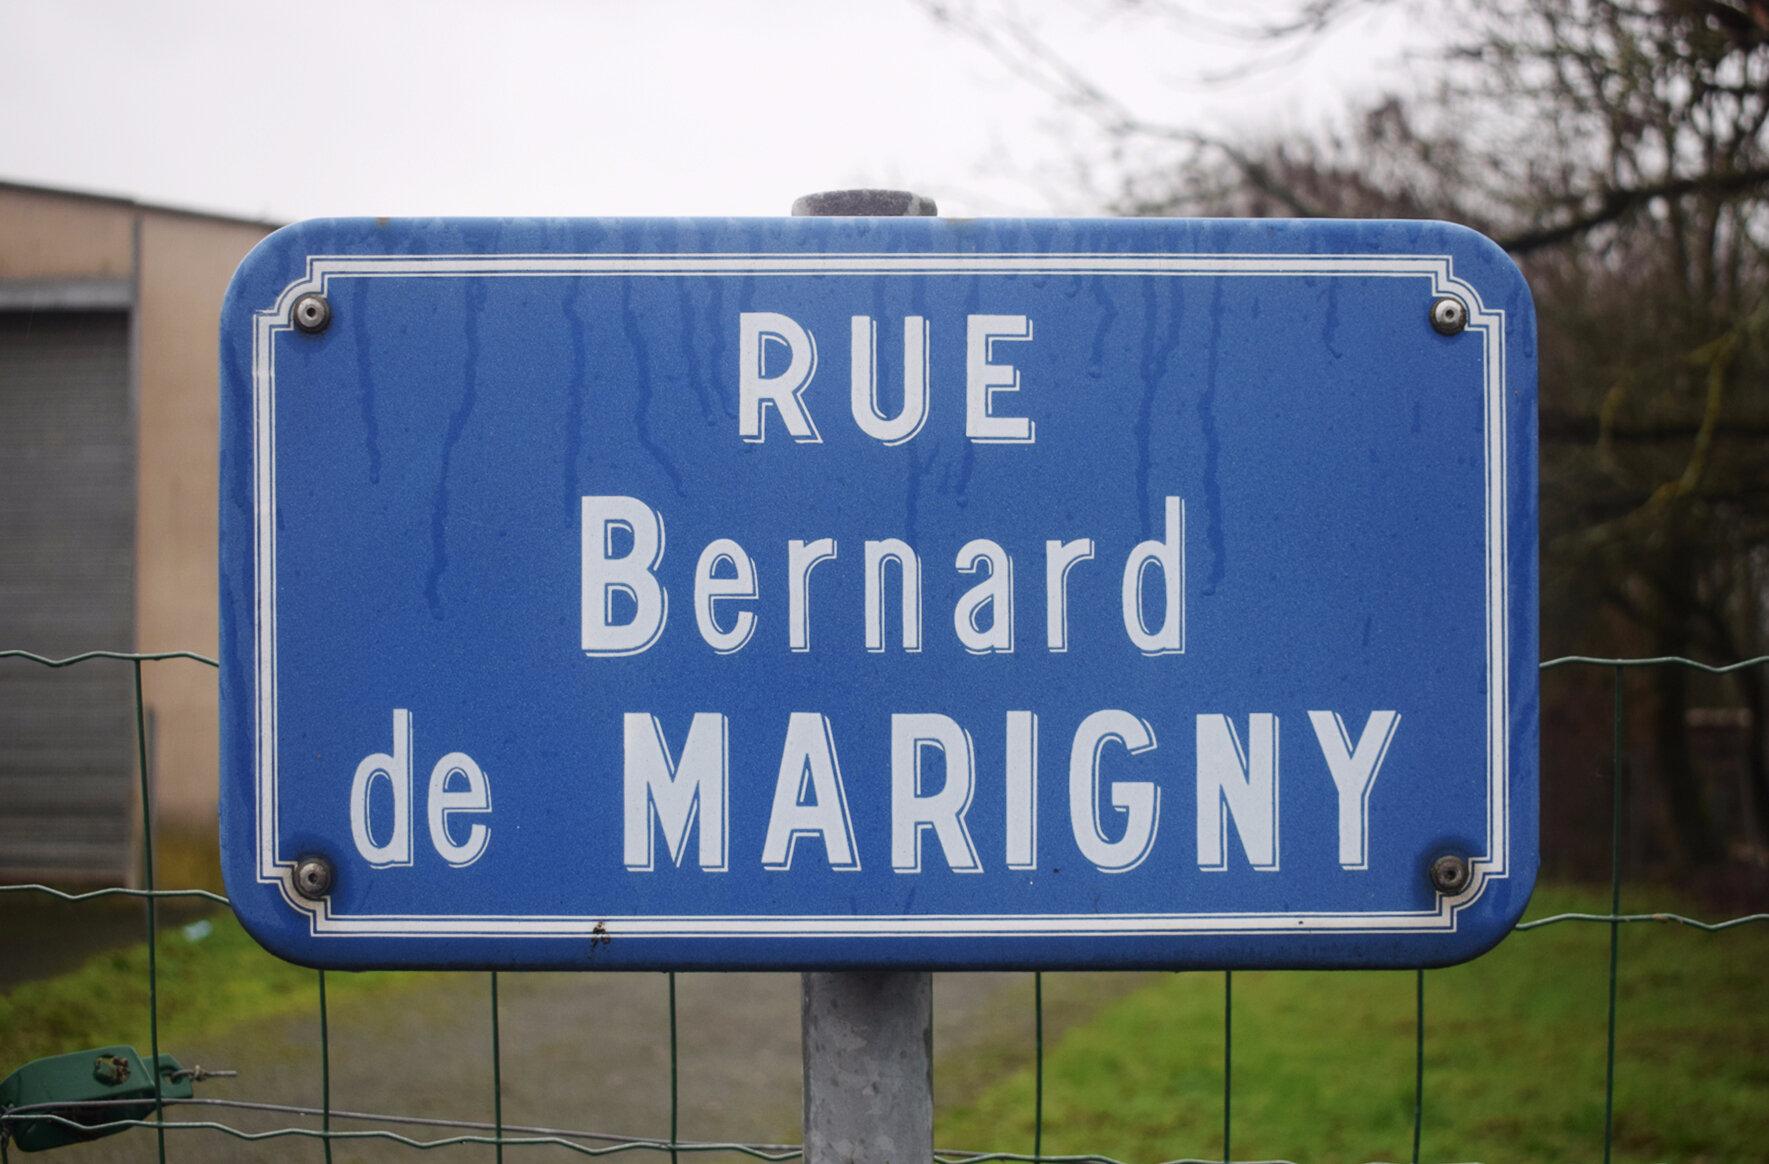 La Châtaigneraie (85), rue Bernard de Marigny